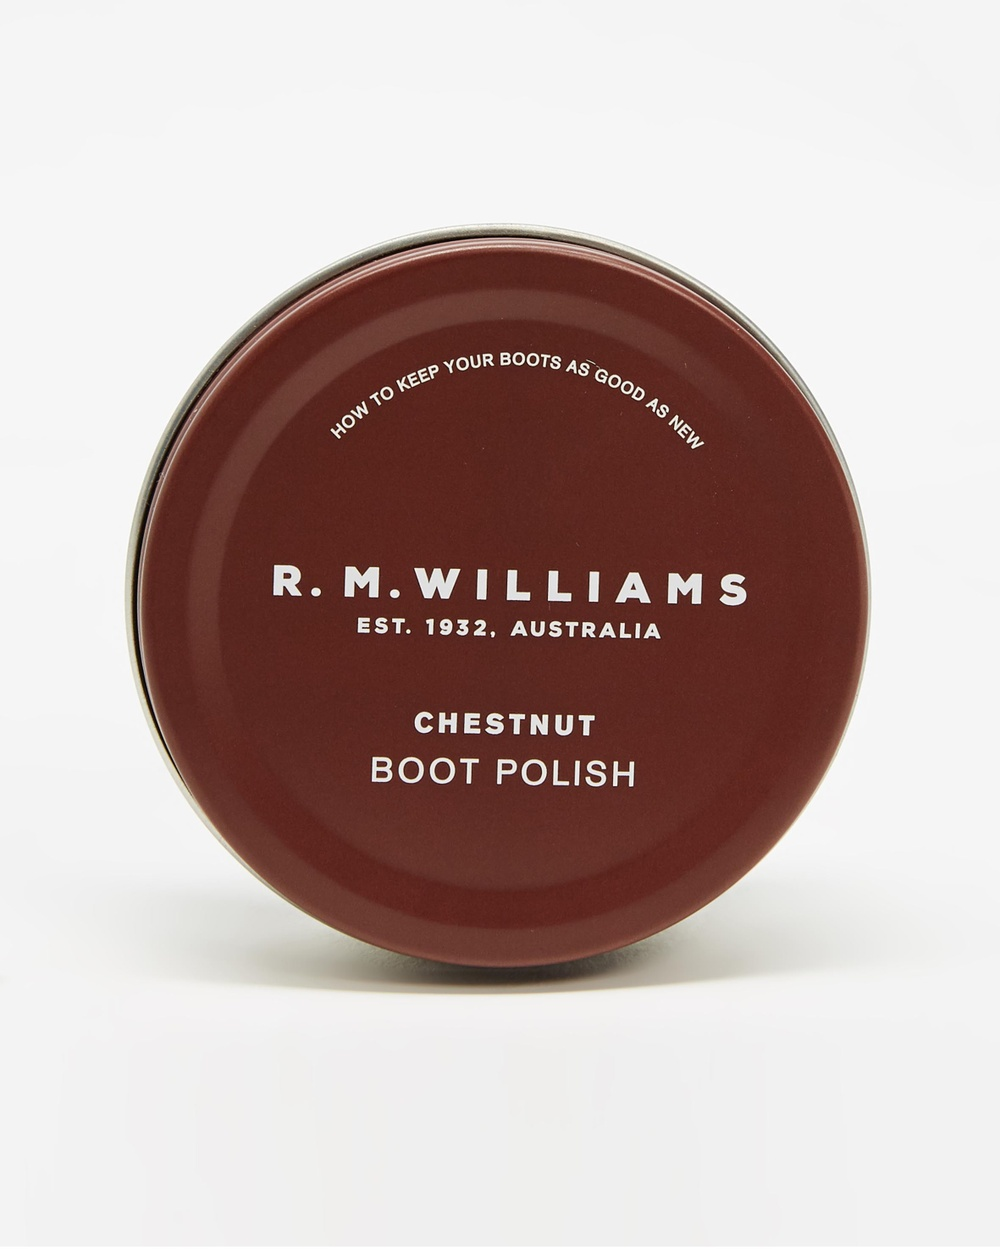 R.M.Williams Stockman's Boot Polish Accessories Chestnut